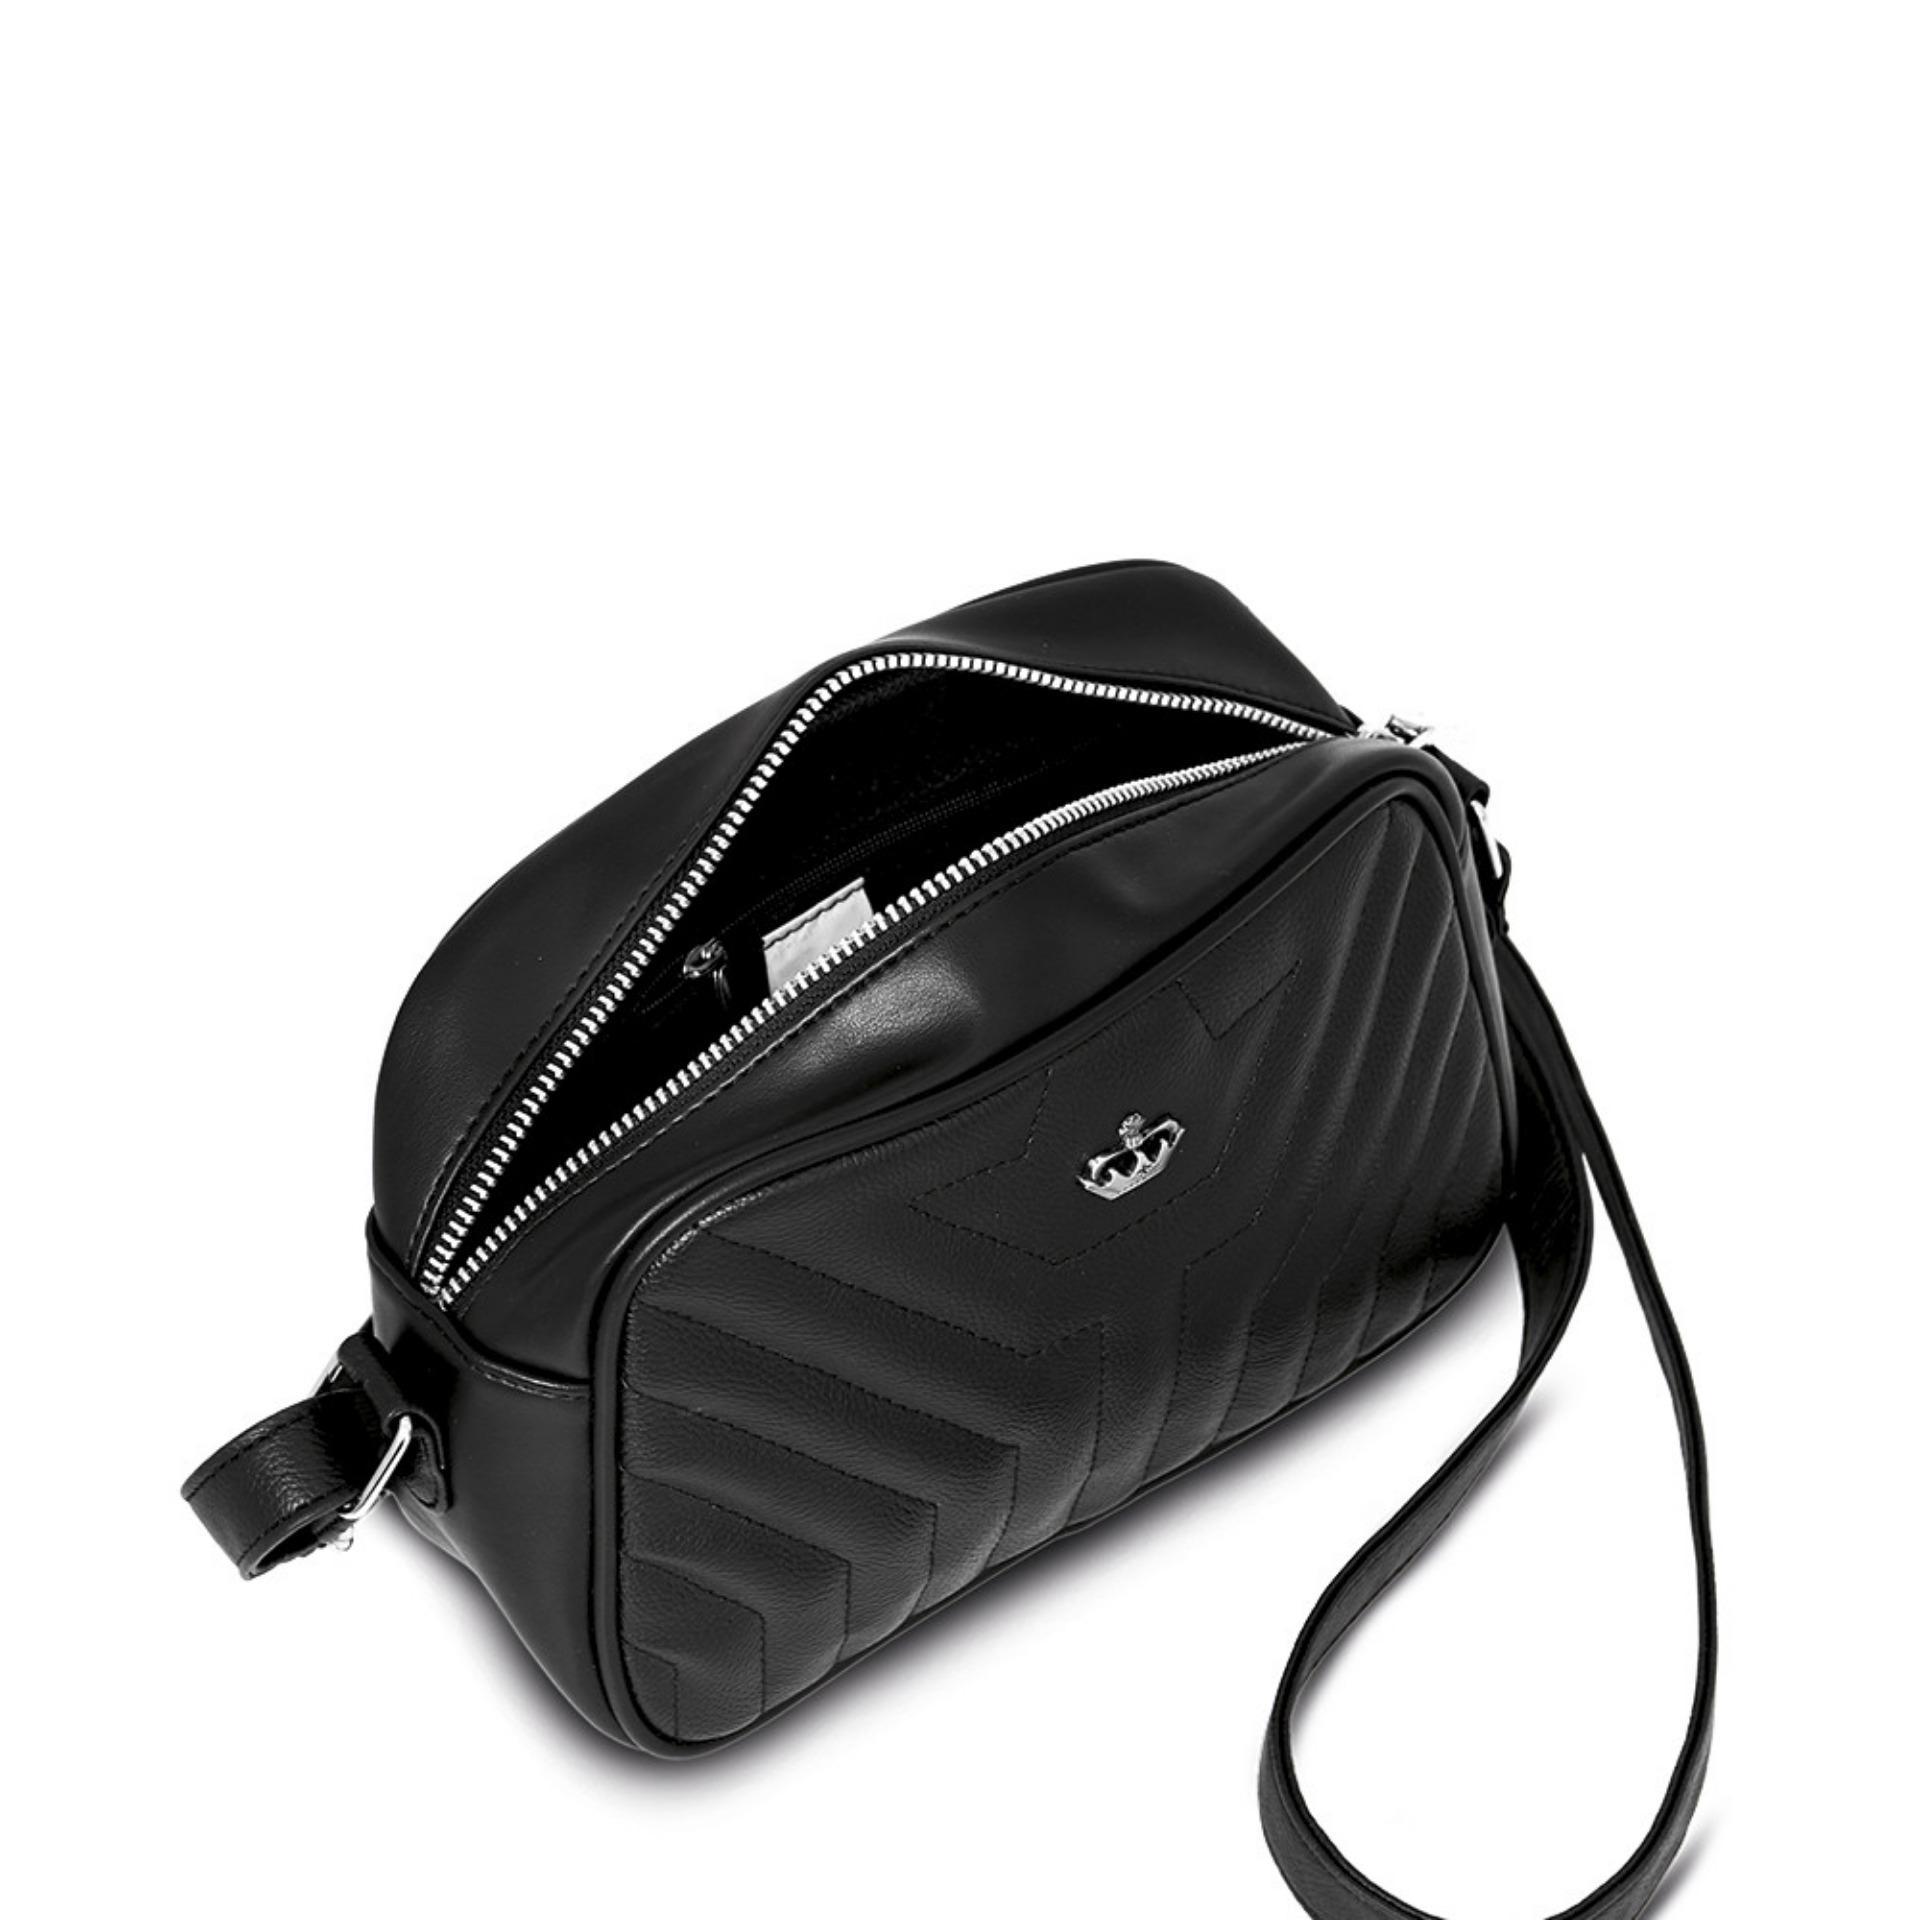 Sophie Paris Tas Selempang Wanita Import Branded Mumbi Bag T4484B5 - Hitam - a7a3ef9110